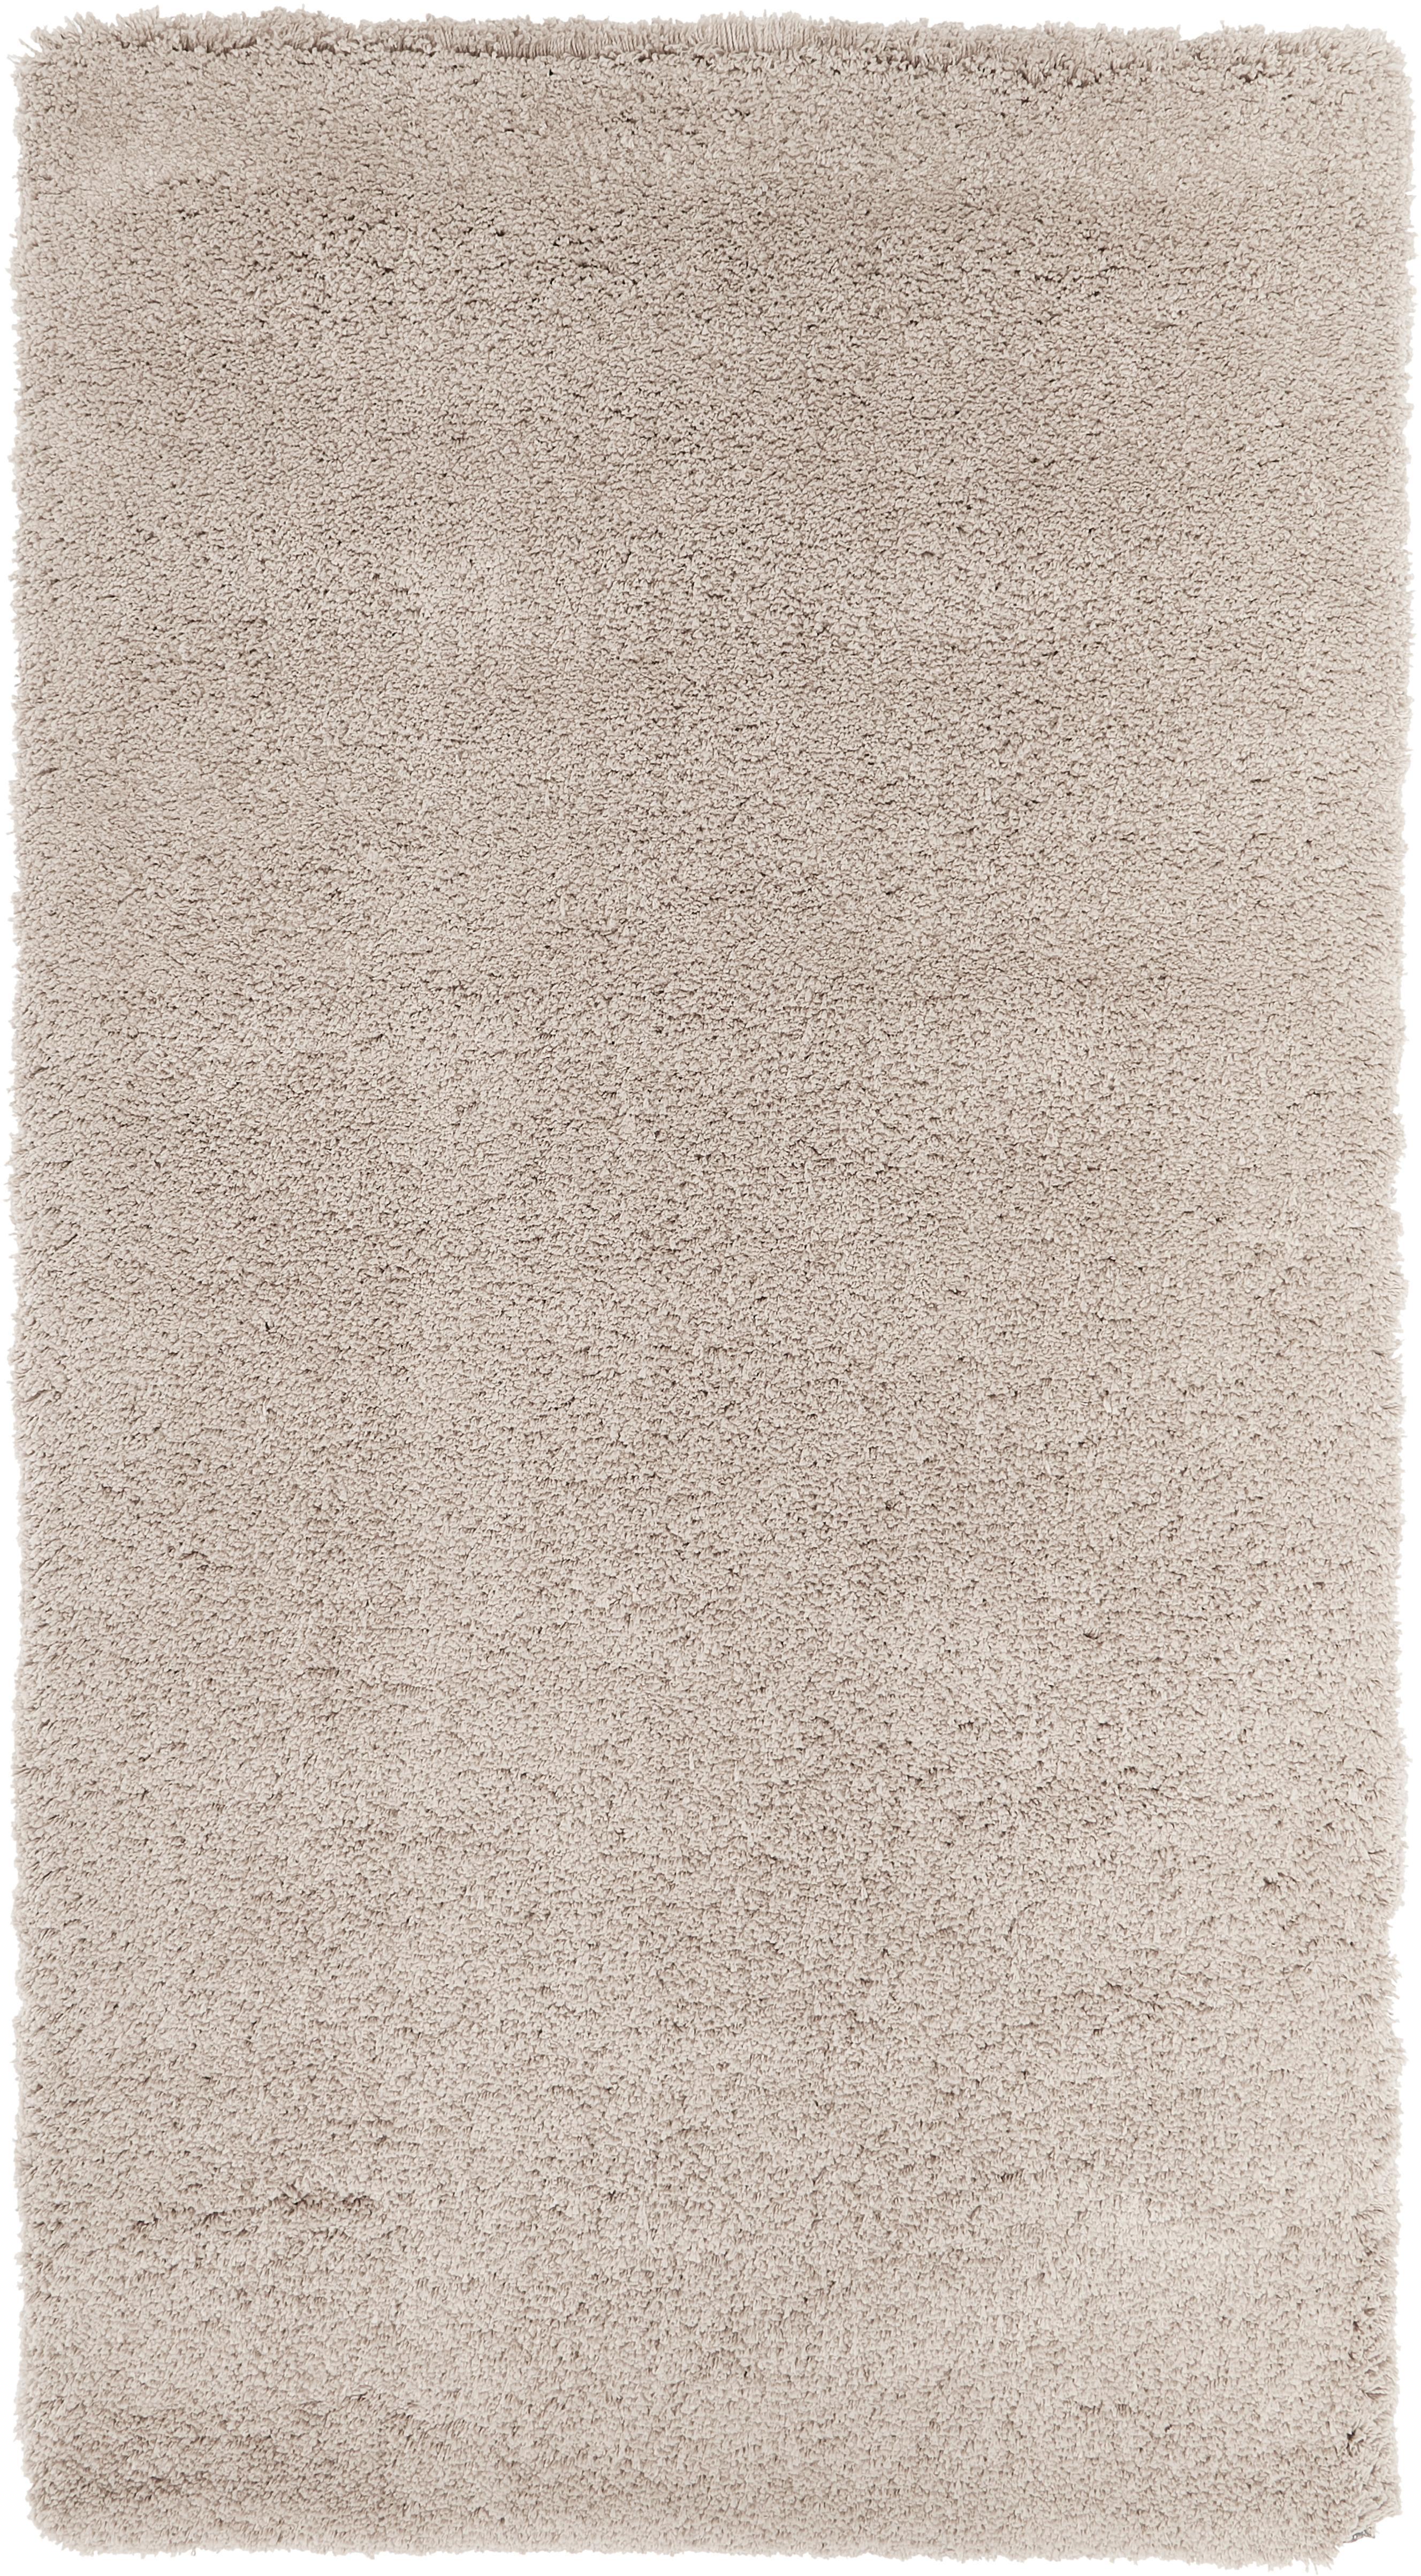 Alfombra mullida de pelo largo Leighton, Parte superior: 100%poliéster (microfibr, Reverso: 70%poliéster, 30%algodó, Beige, An 80 x L 150 cm (Tamaño XS)